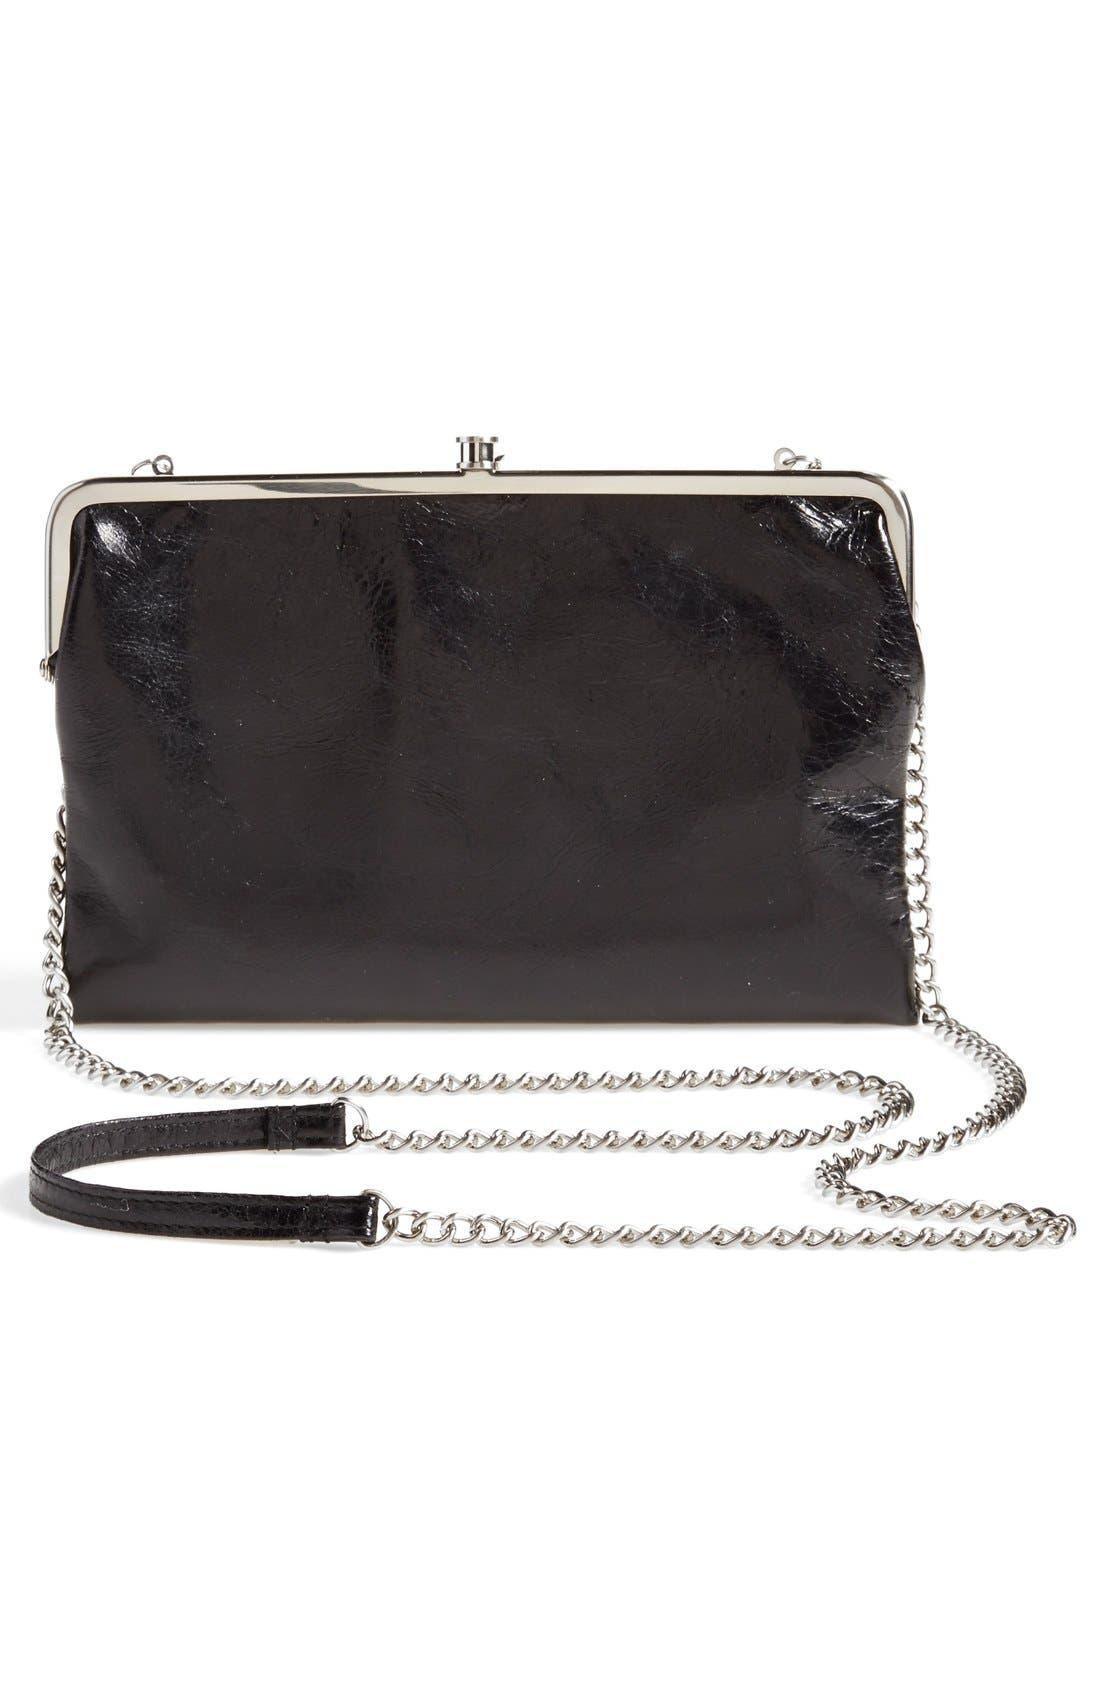 'Vintage Leanne' Leather Crossbody Bag,                             Alternate thumbnail 4, color,                             001